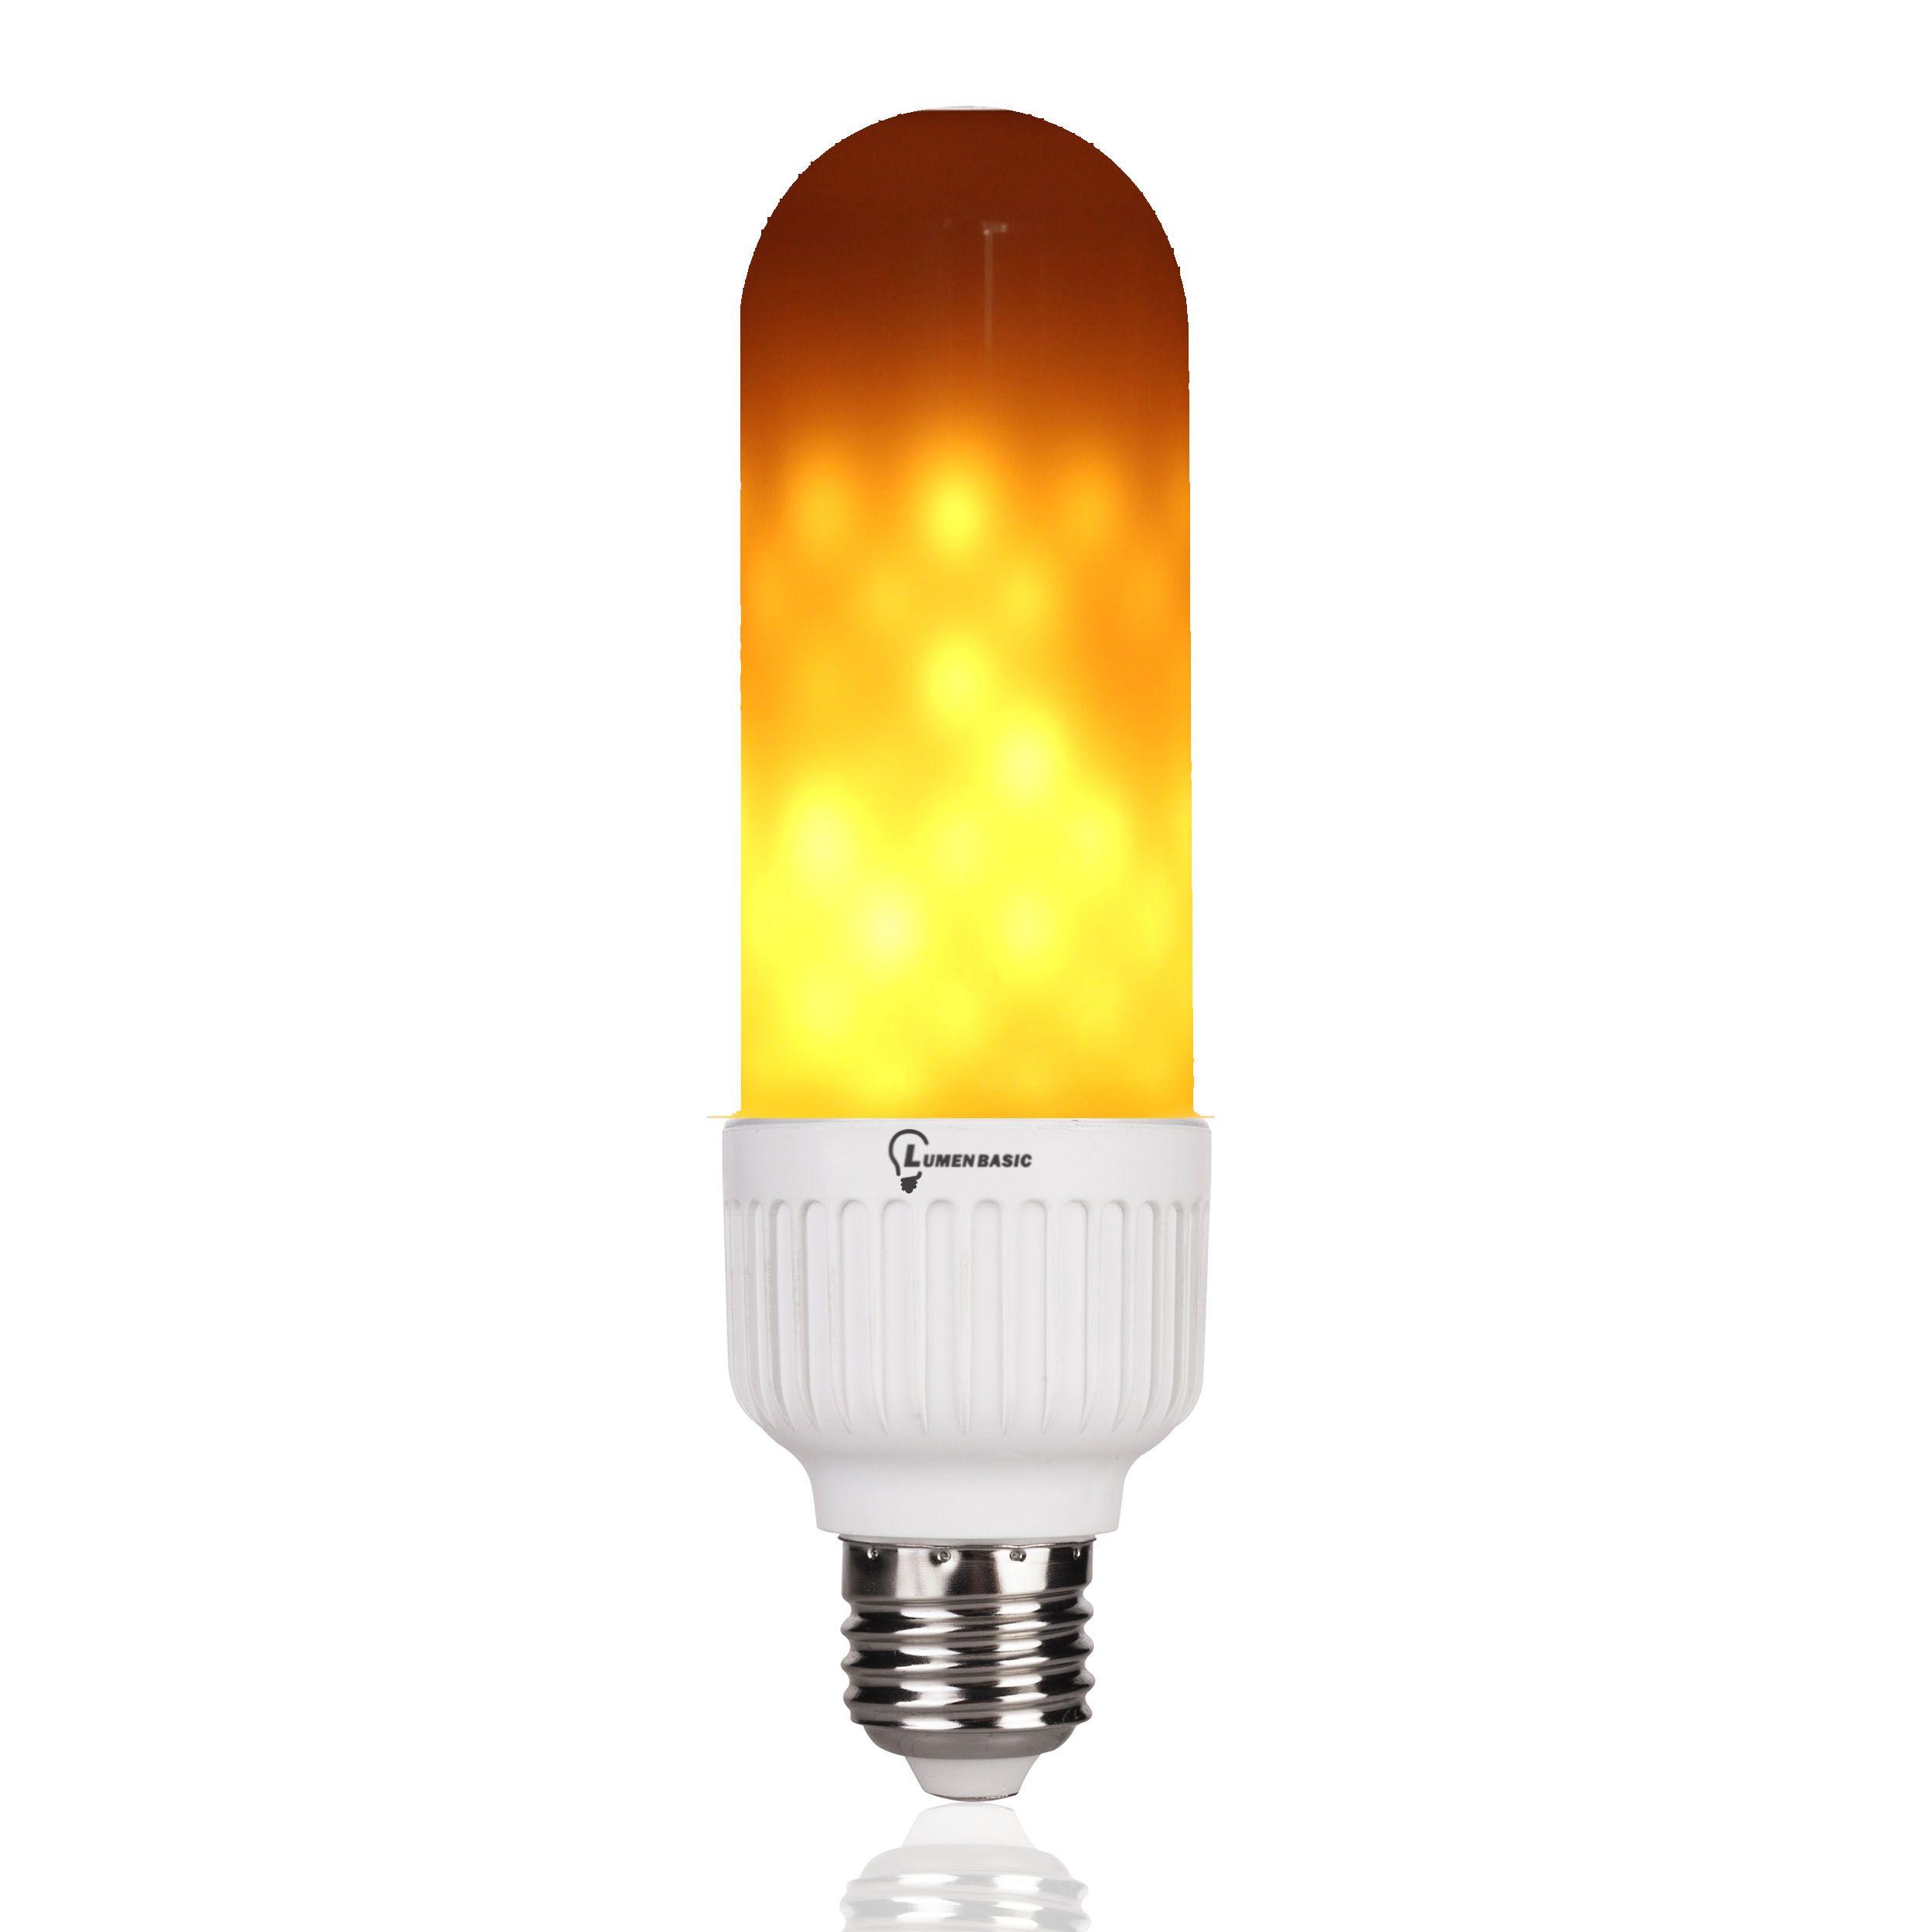 Lumenbasic Flickering Flame Light Bulb E26 Led Flame Effect Light Bulb Decorative Atmosphere Lighting Vintage 5w Three Modes Ac 110v 120v Flaming Light Bulb For Lamp Light Bulb Decorative Light Bulbs